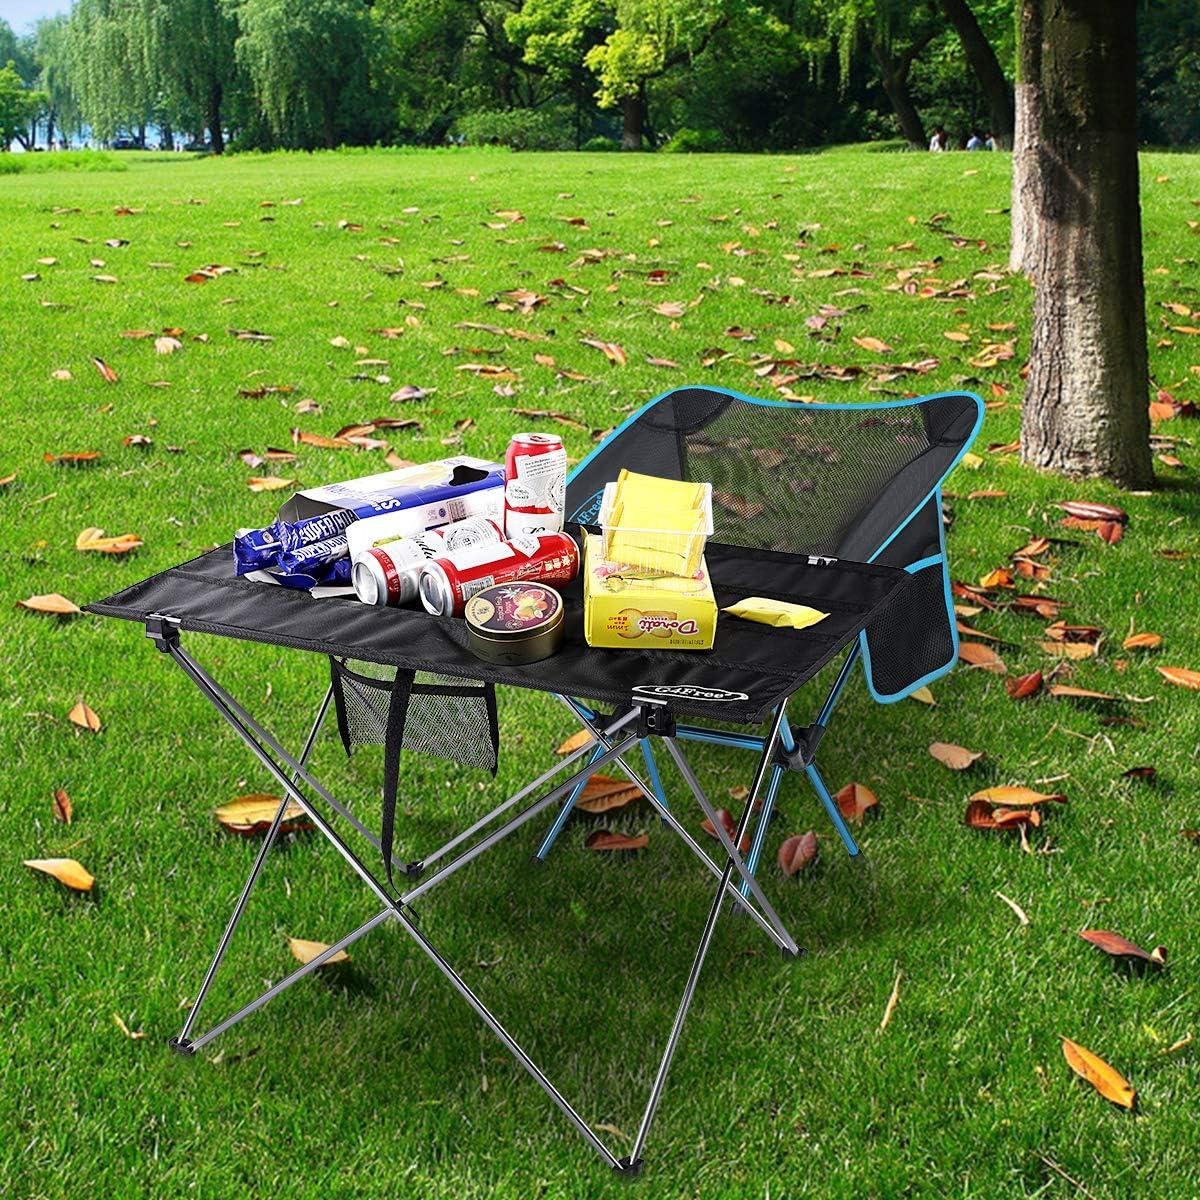 con Bolsa de Transporte para Exteriores Senderismo G4Free Plateado Medium Camping Picnic Mesa Plegable port/átil y Plegable para Acampada